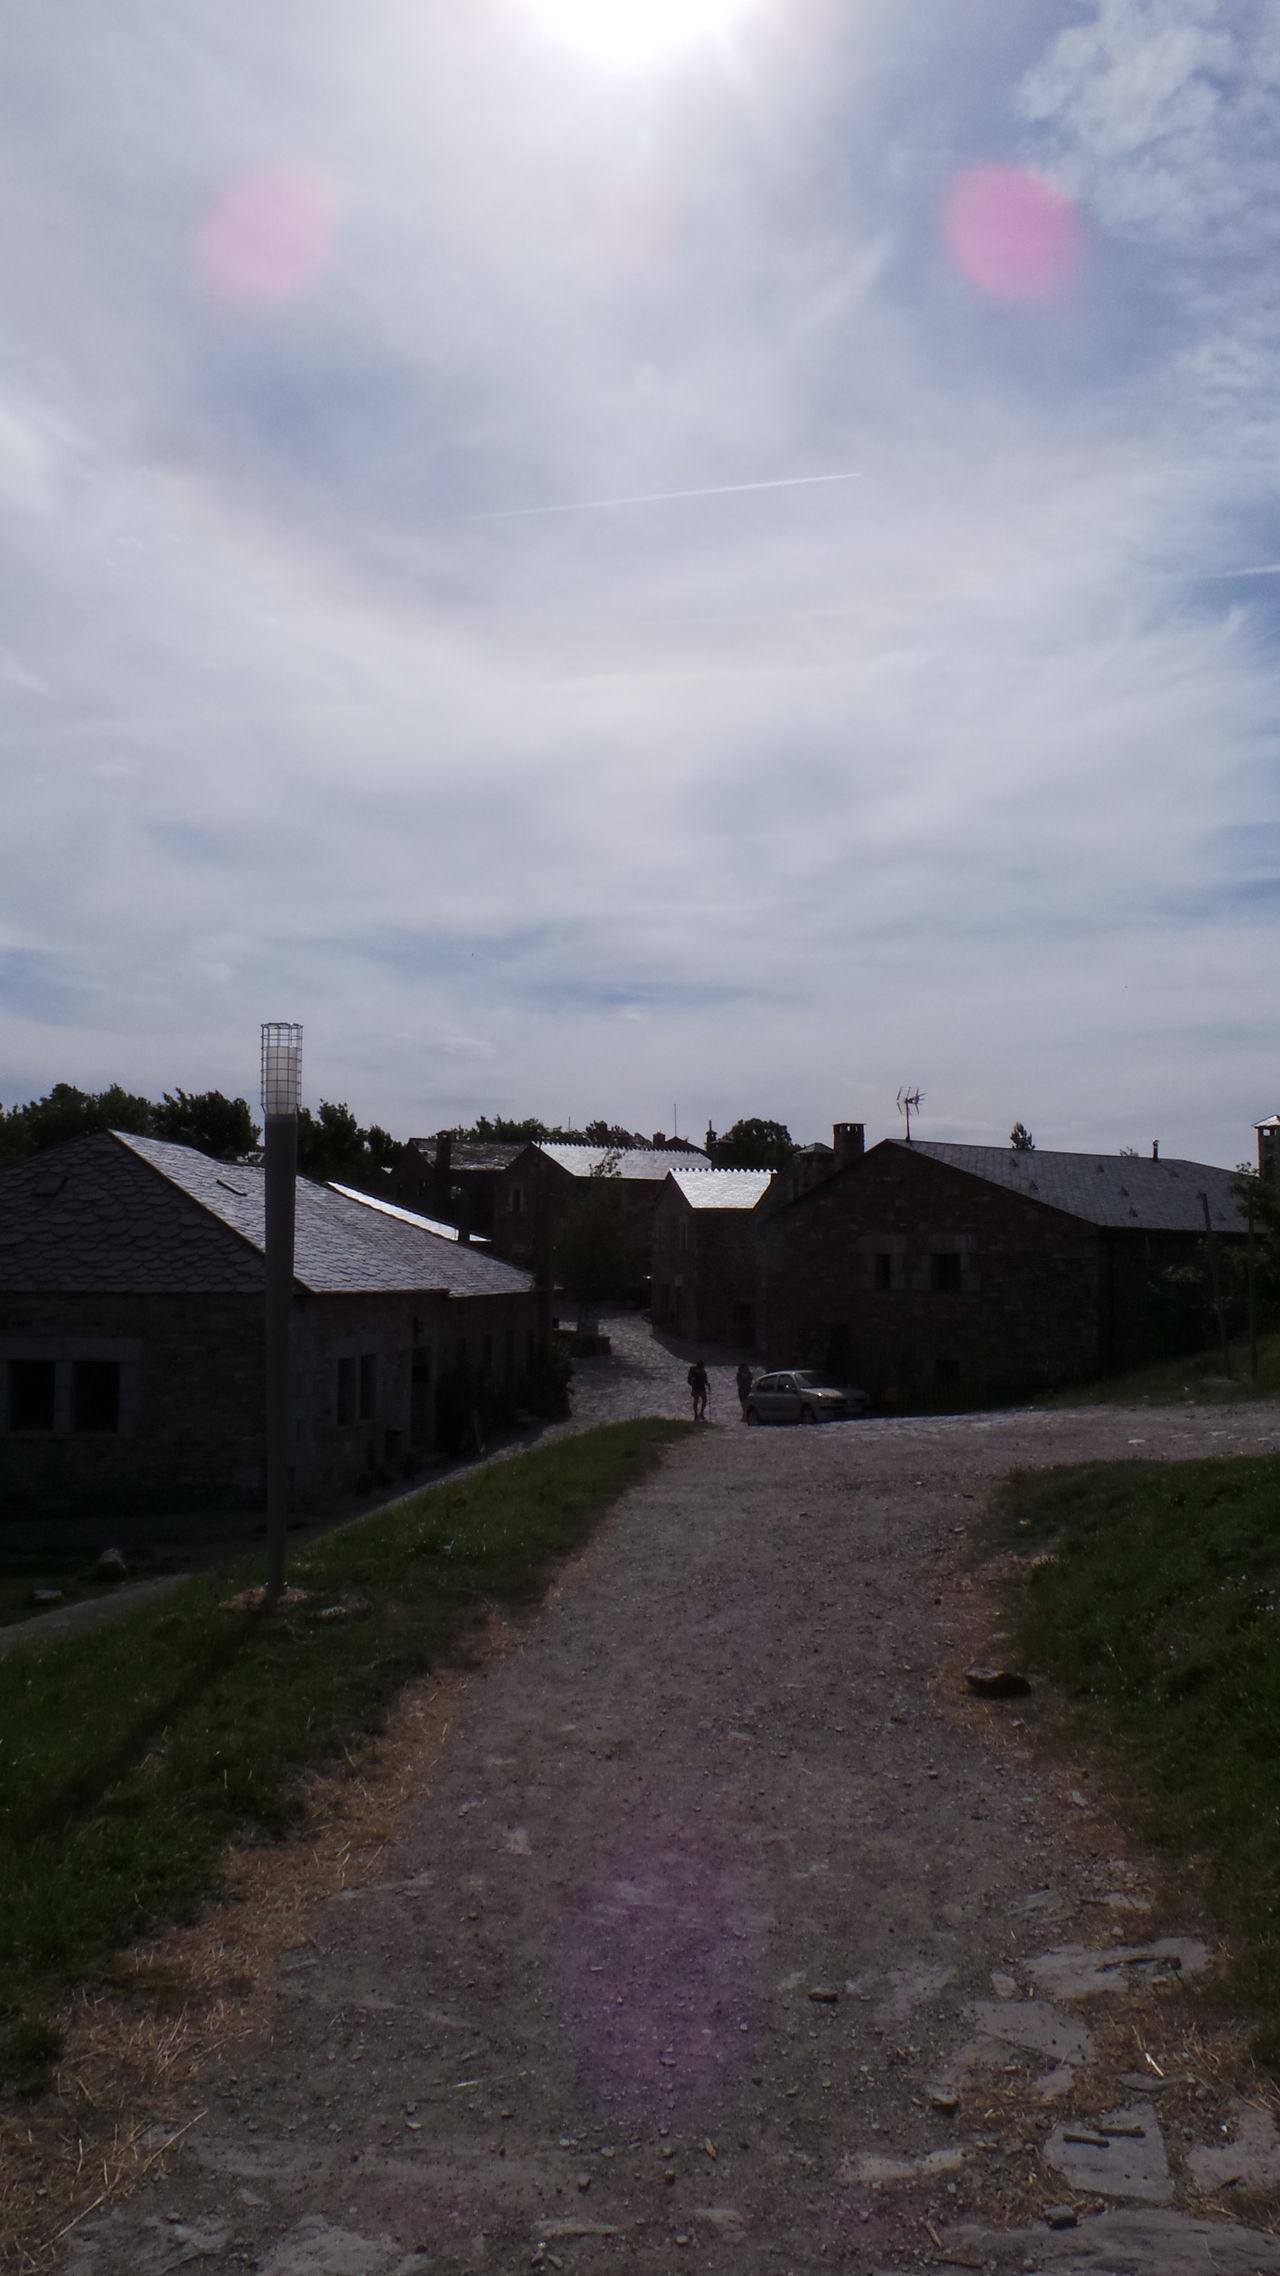 Camino CaminodeSantiago Cebreiro El Camino Jakobsweg Pilgern Pilgerschaft Pilgrimage Way Way Of Saint James Weg